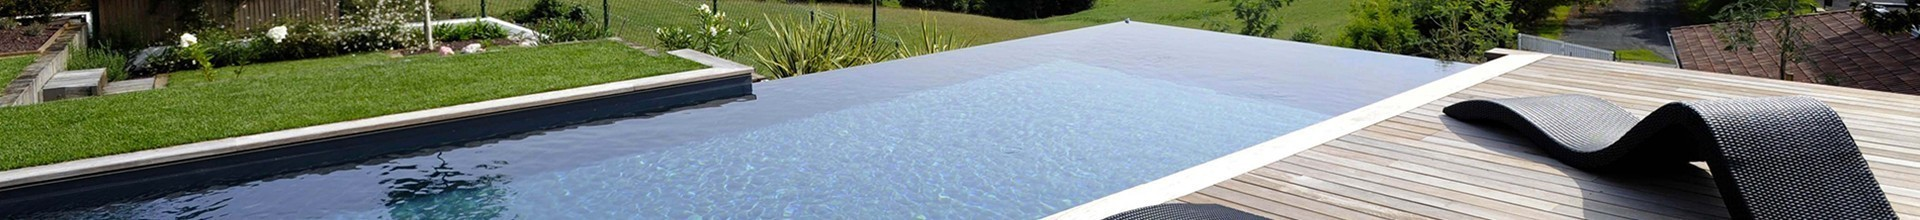 Direct usine, piscine coque prix Meyrin